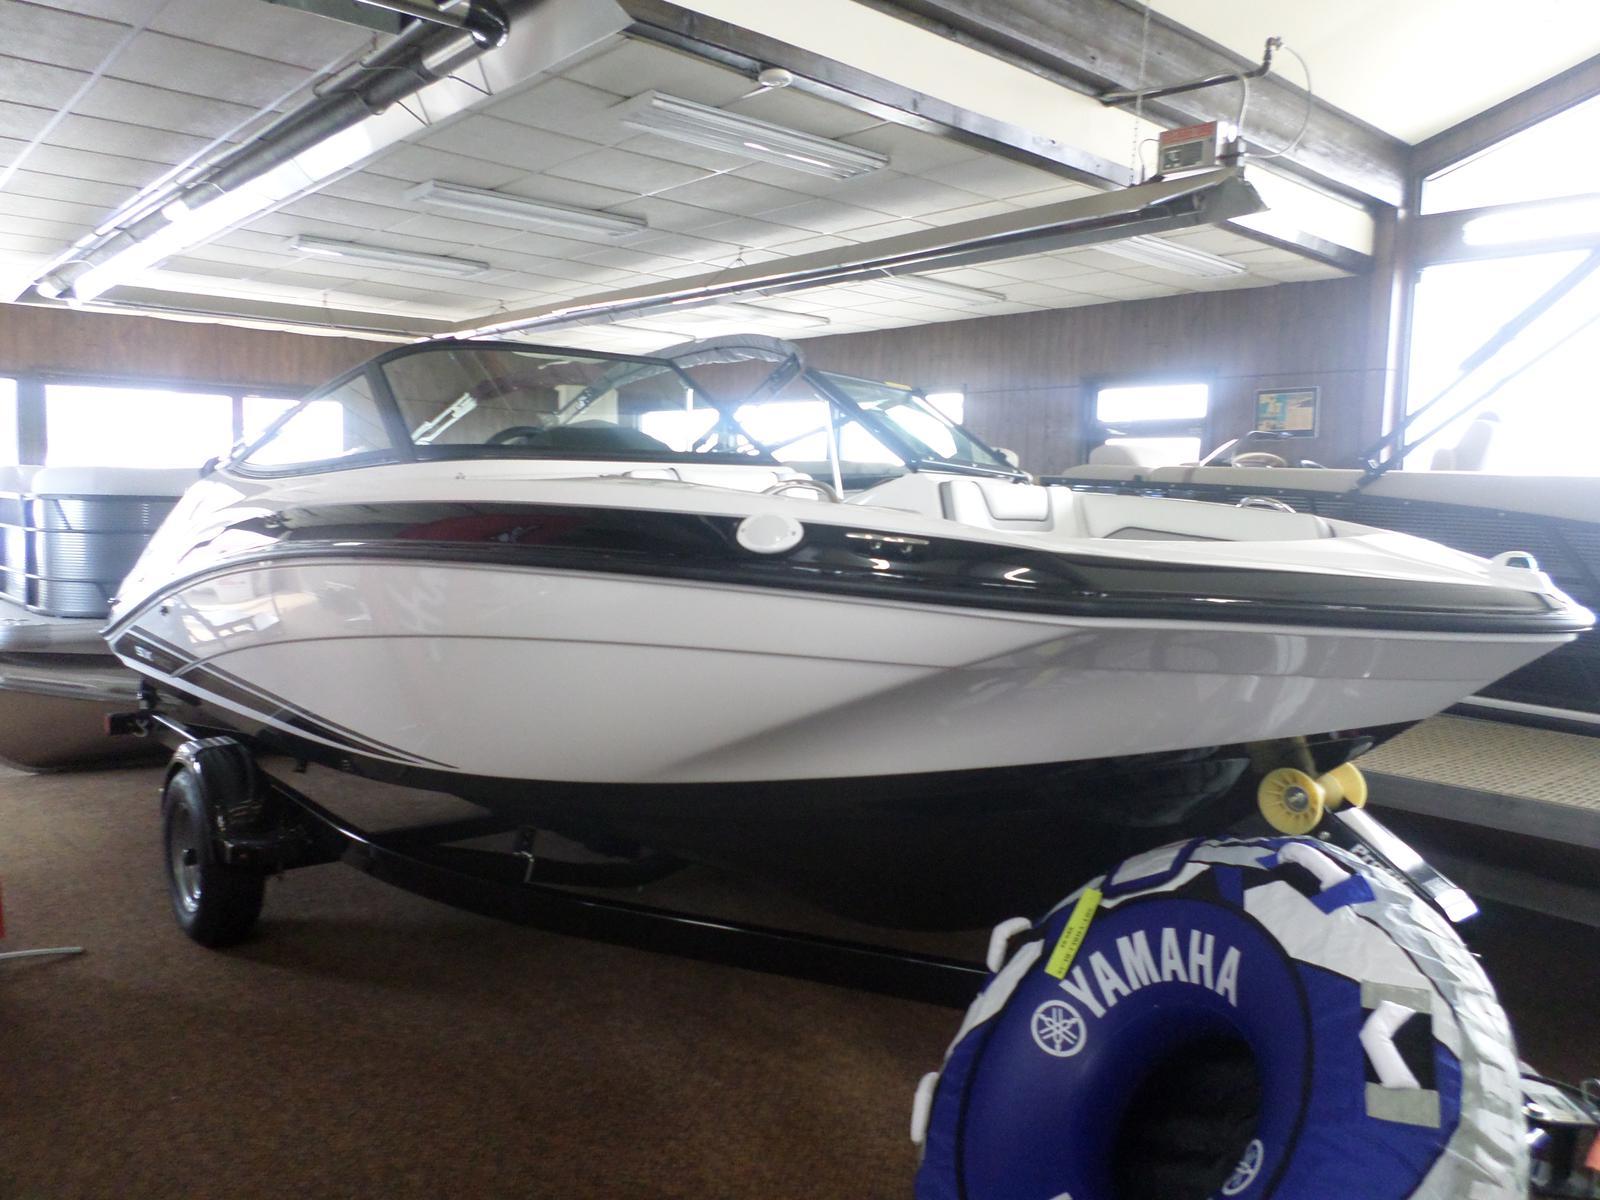 Yamaha jet boats SX190